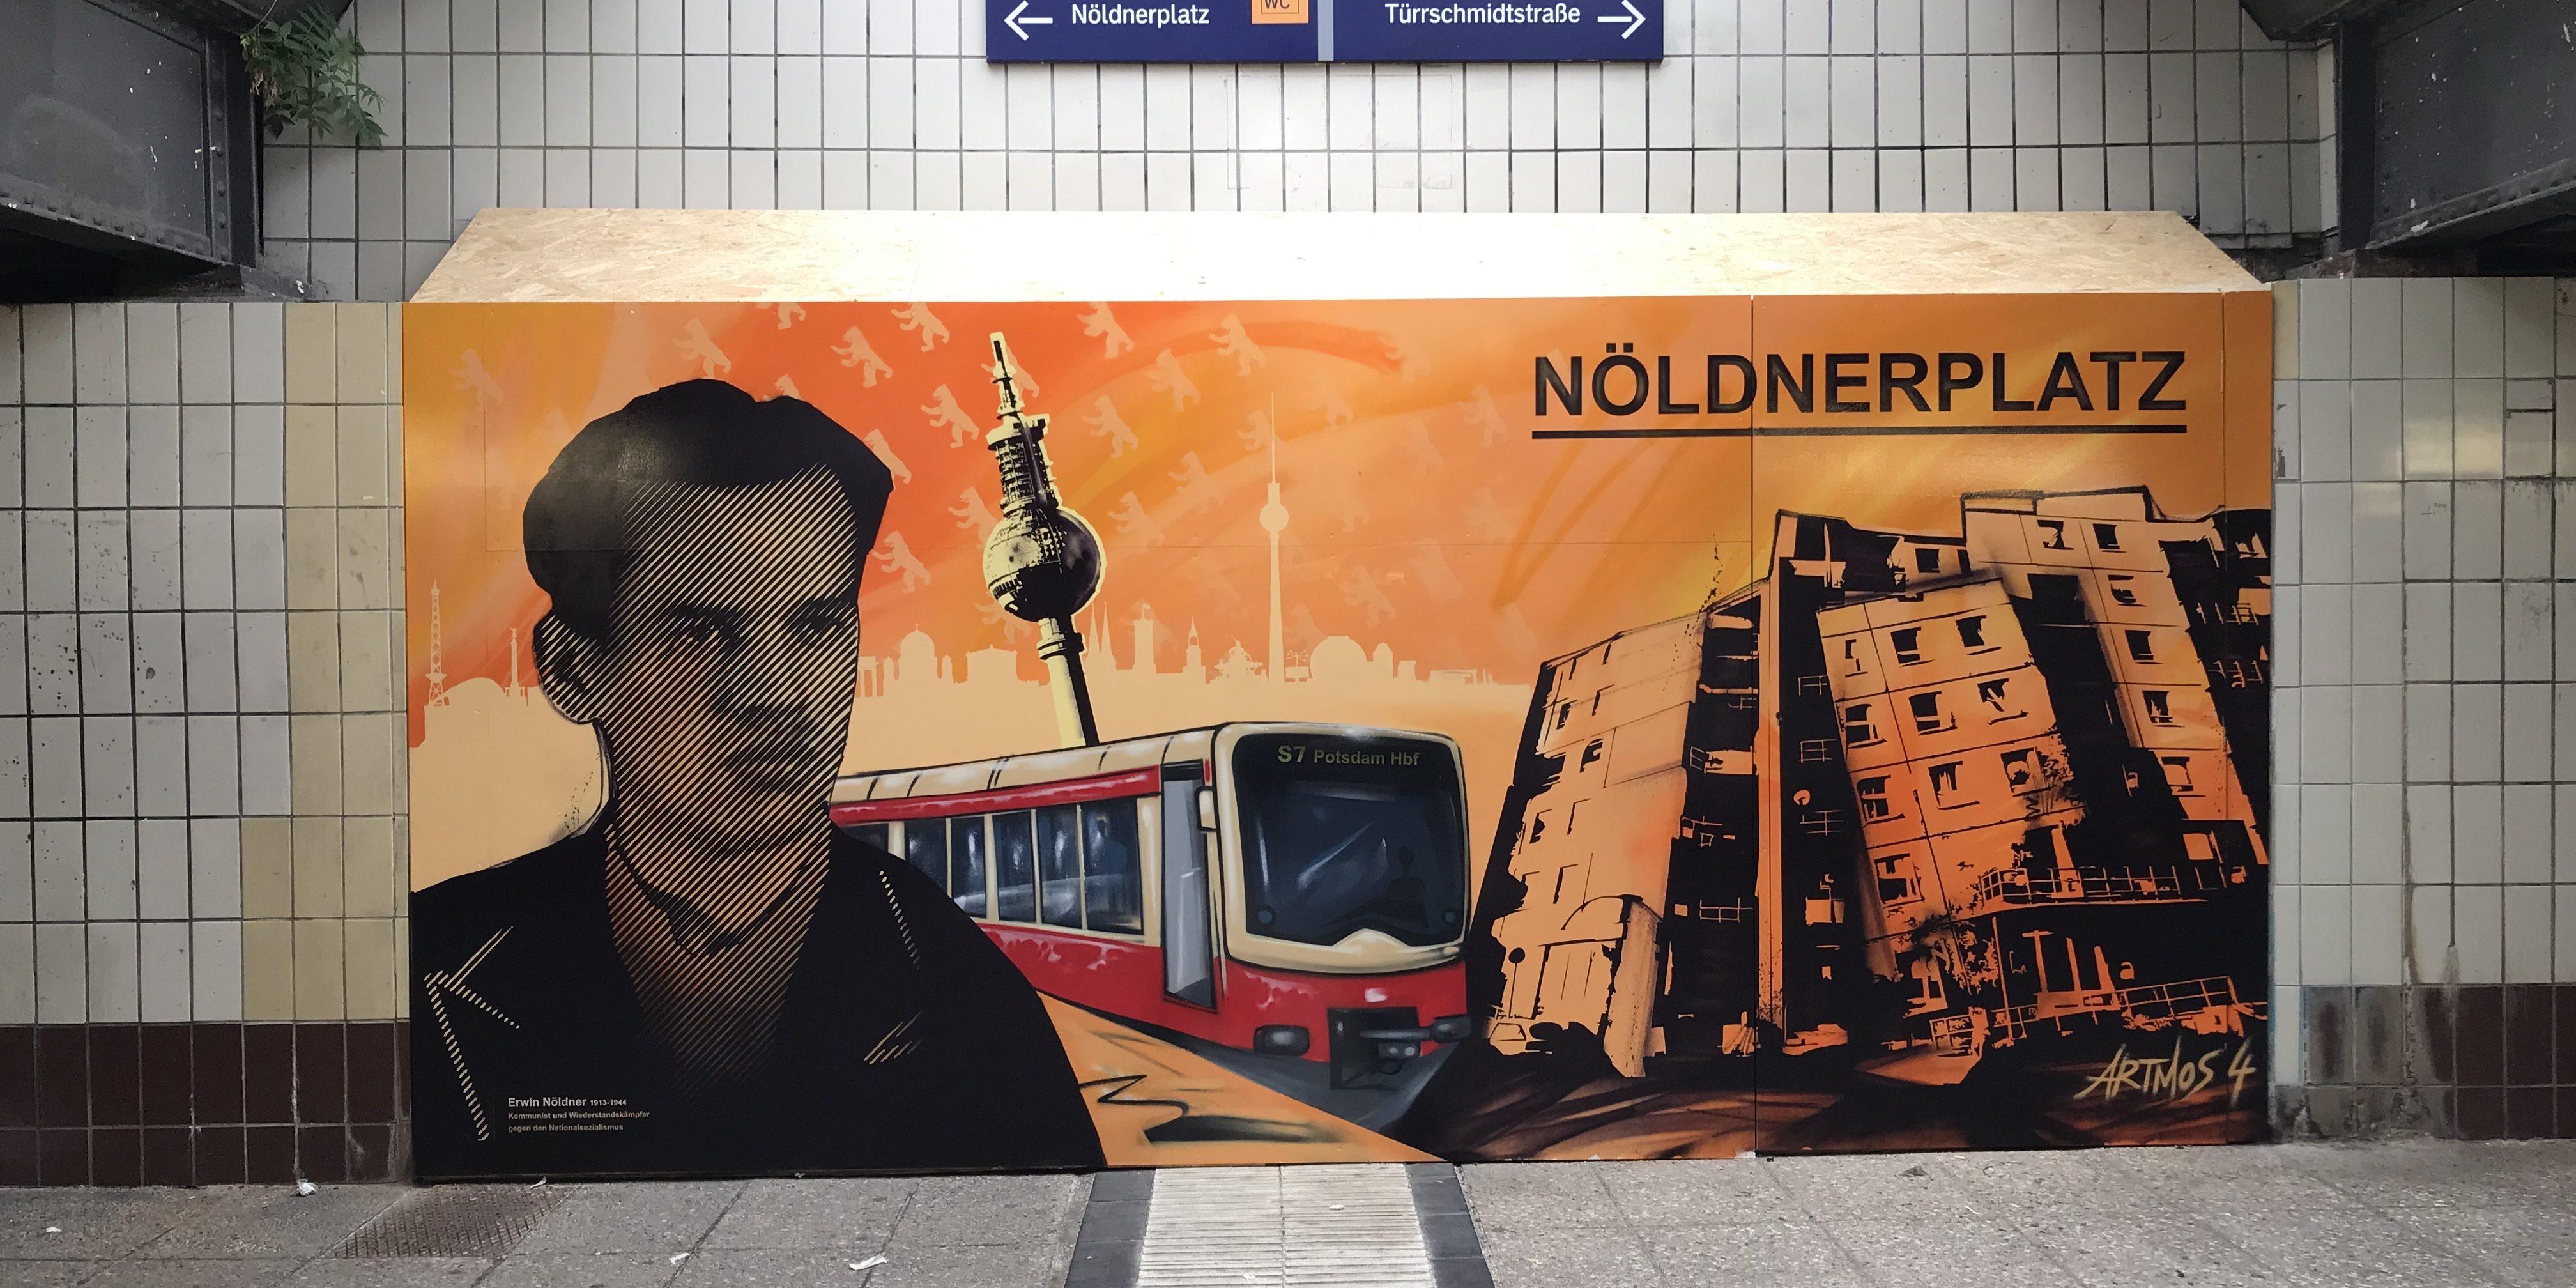 Graffitiauftrag-Graffiti-Deutsche-Bahn-Berlin-Noeldner-Platt-Skyline-S-Bahn-03